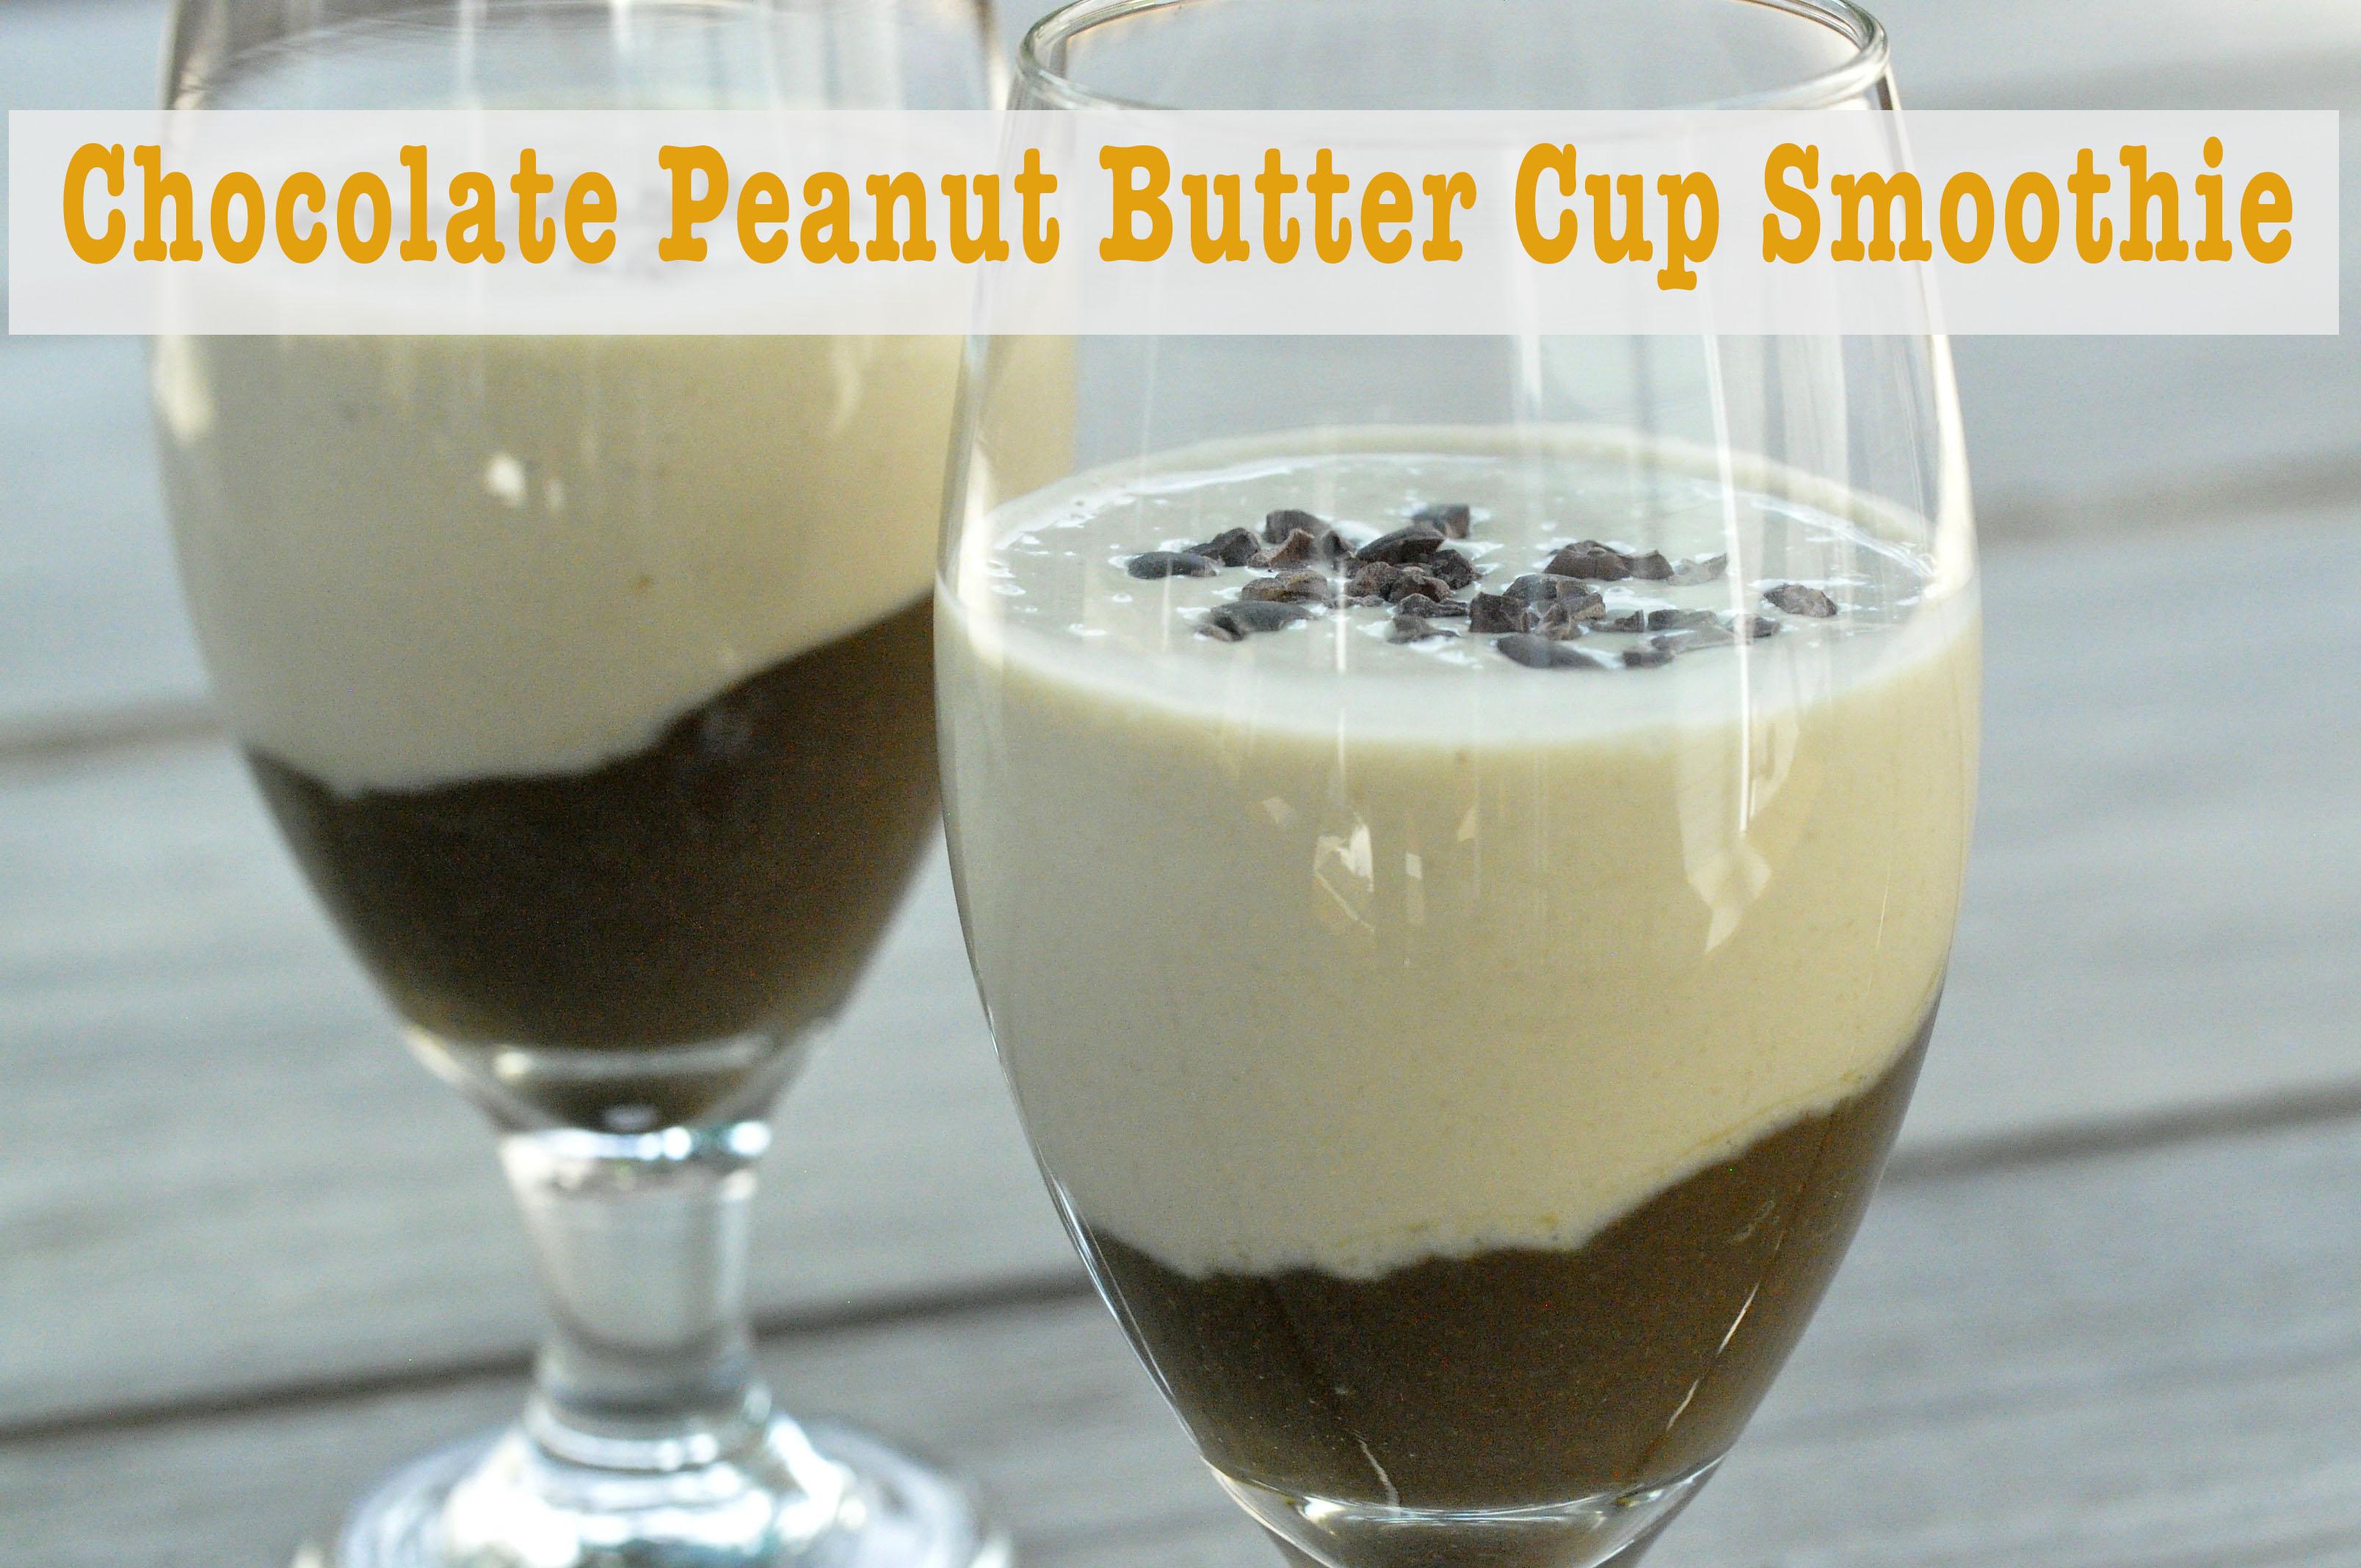 choc pb cup smoothie POST